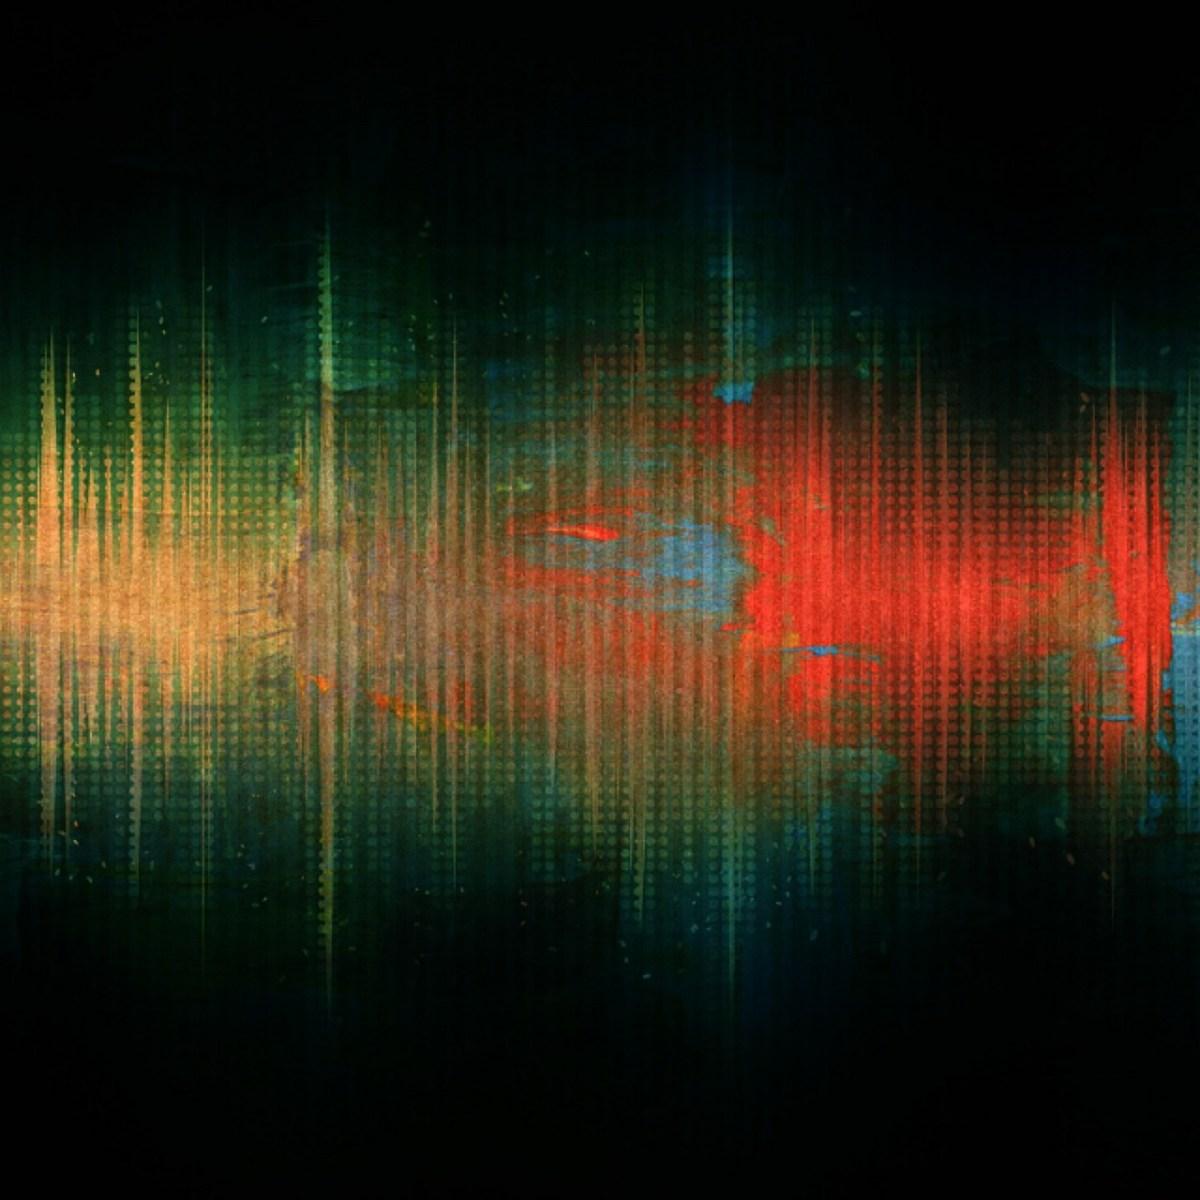 https://i0.wp.com/thesubmarine.it/wp-content/uploads/2019/06/sonic-wave-459858_1280.jpg?fit=1200%2C1200&ssl=1